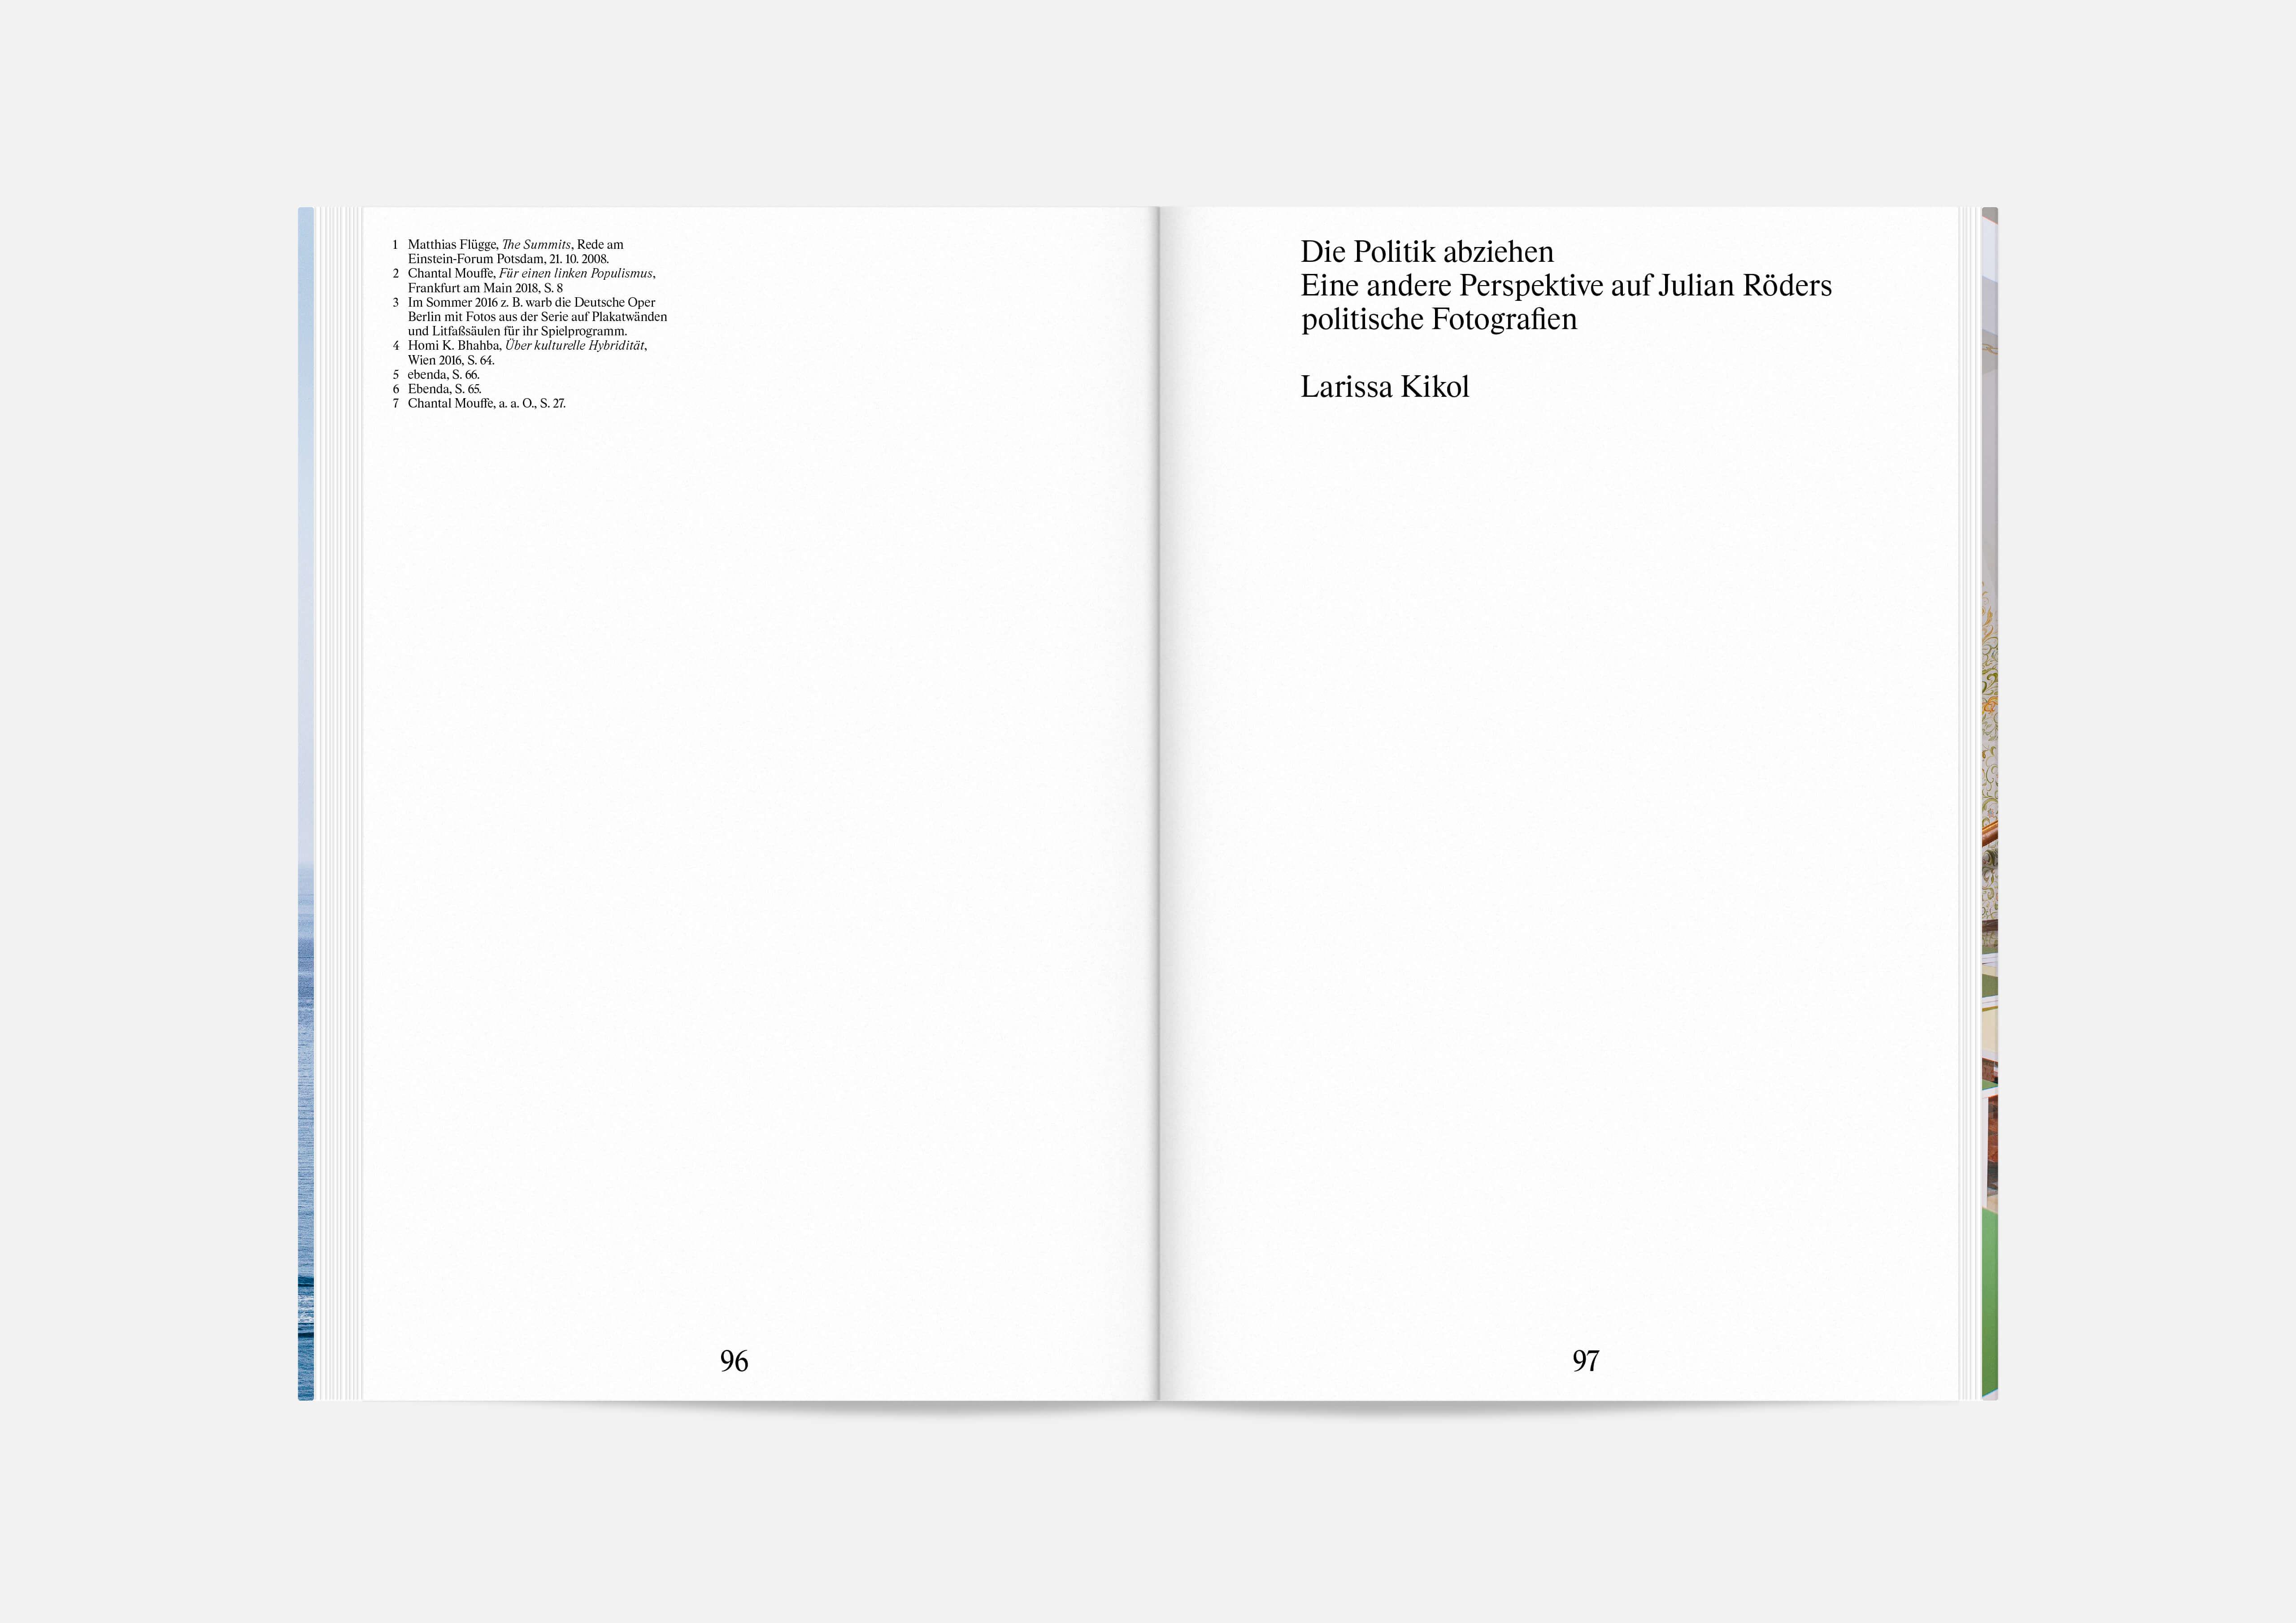 https://neuegestaltung.de/media/pages/clients/julian-roeder/a13c785167-1610896617/jr-glauben_19.jpg